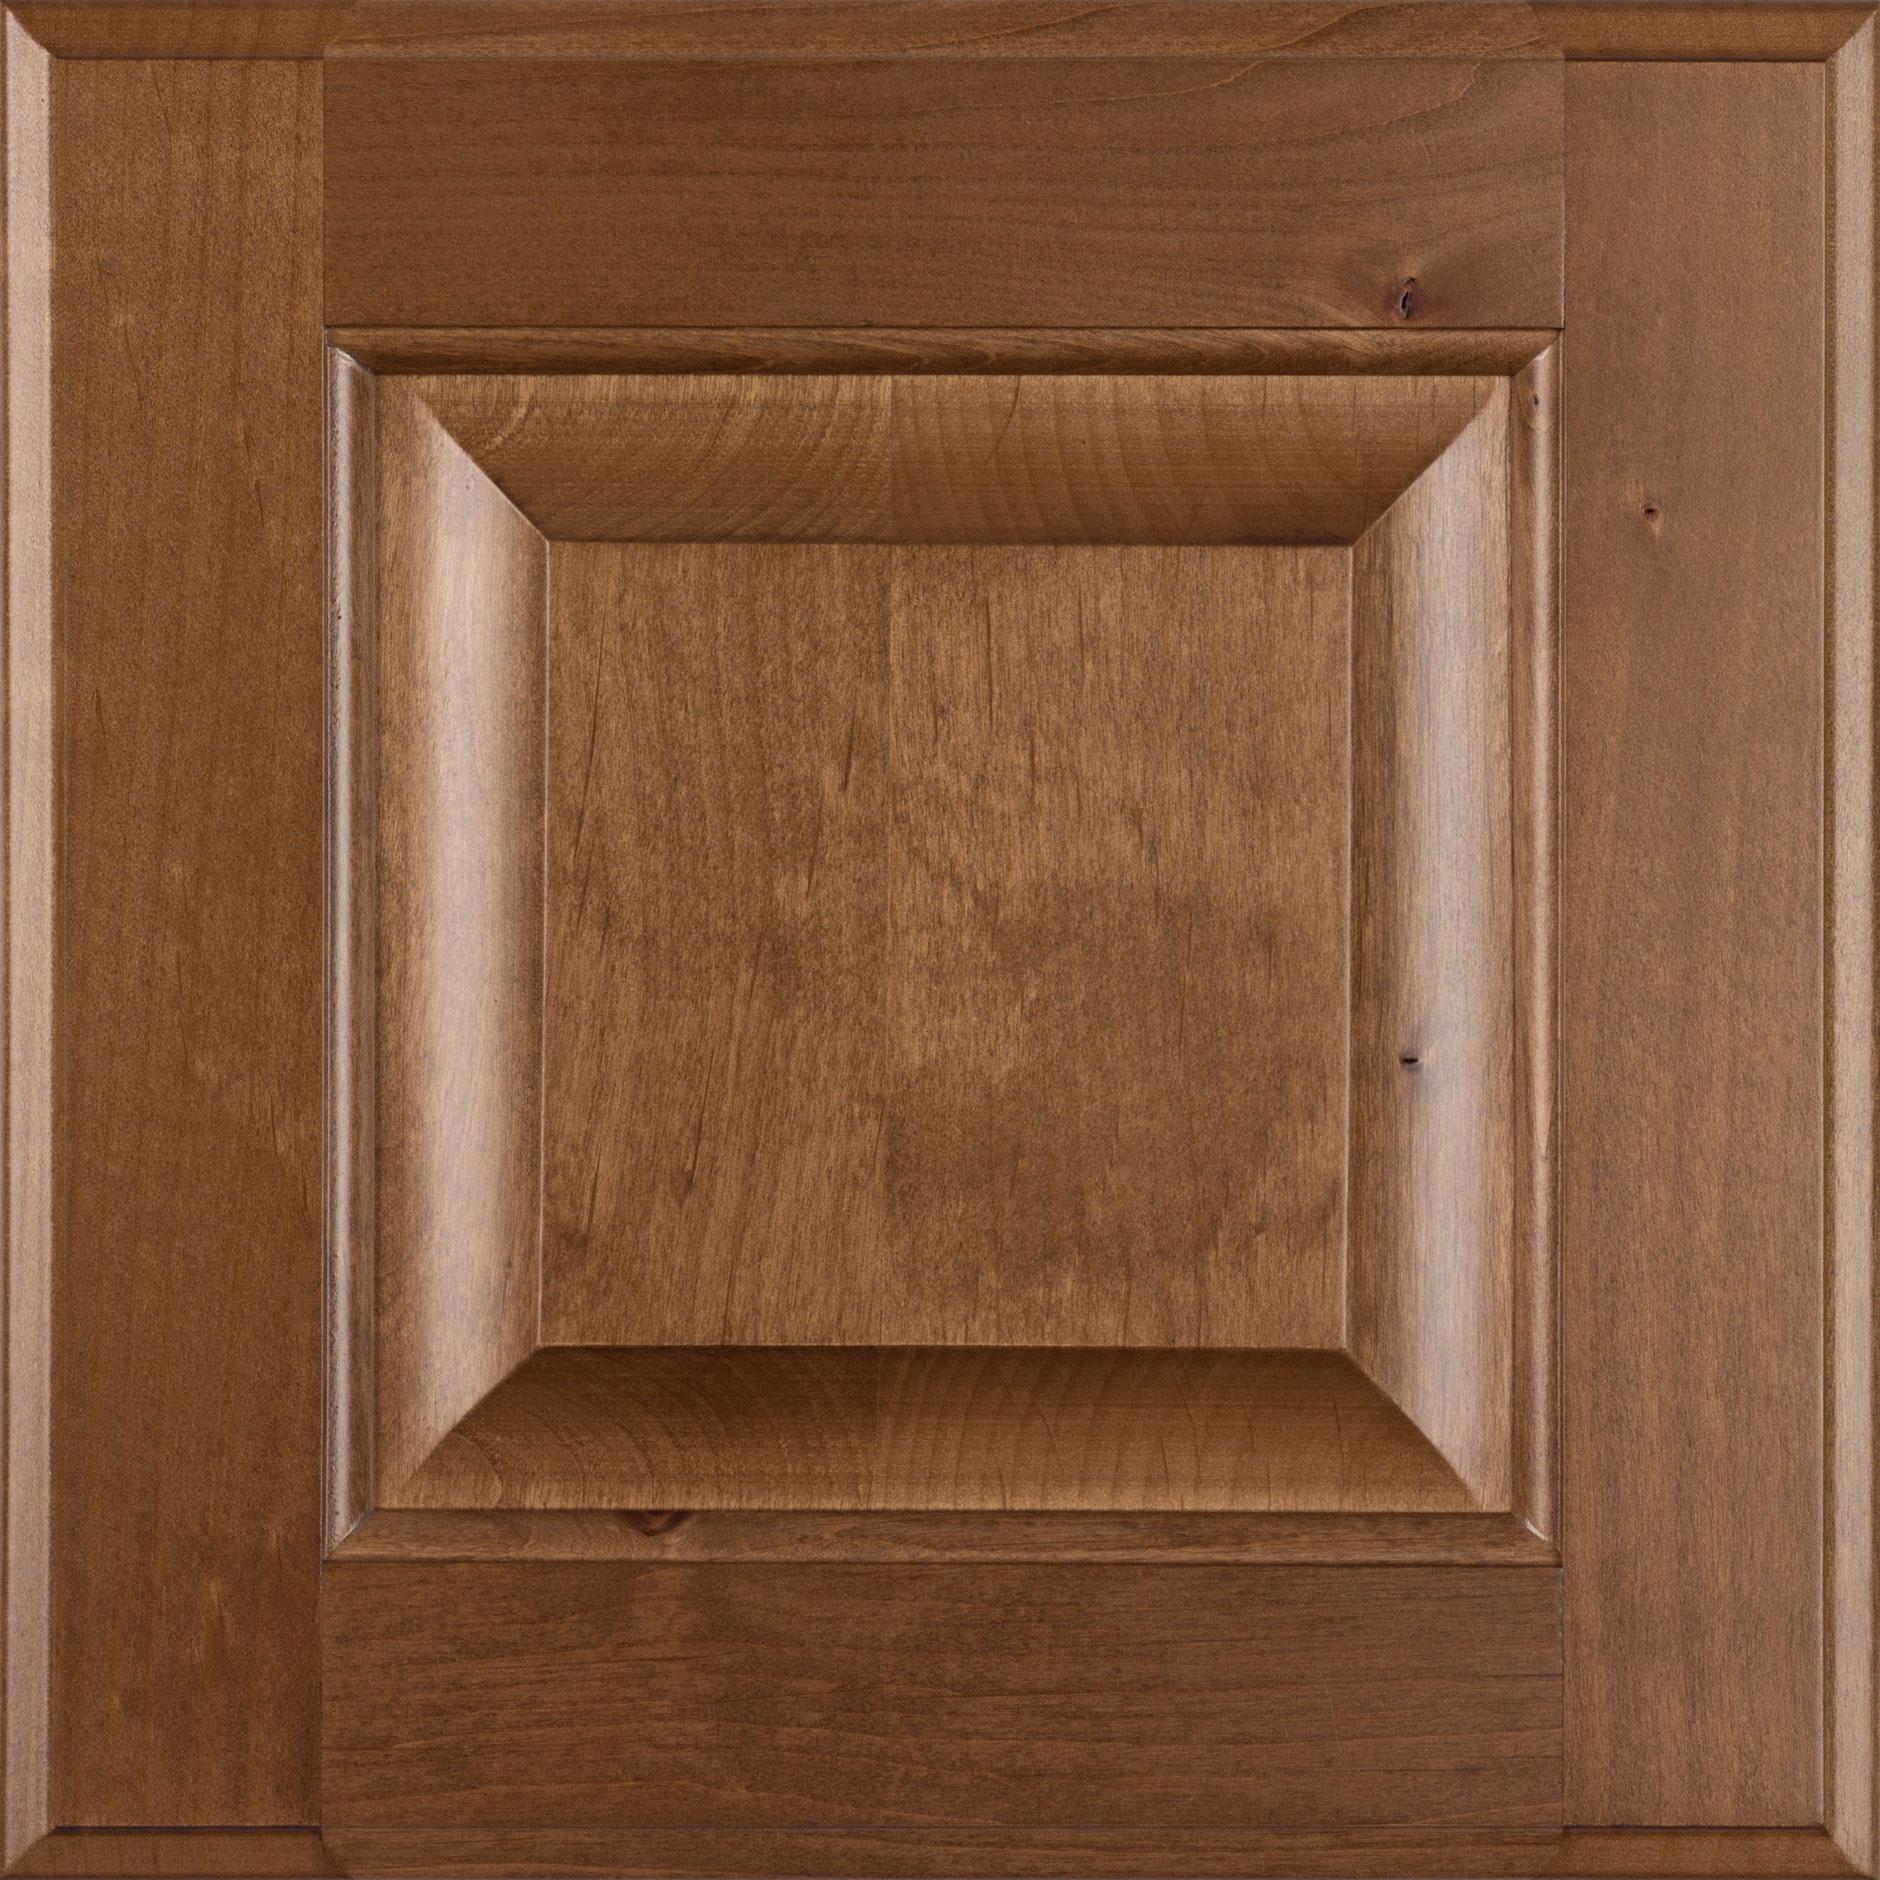 5 Piece Raised Panel In Clear Alder Bali Burrows